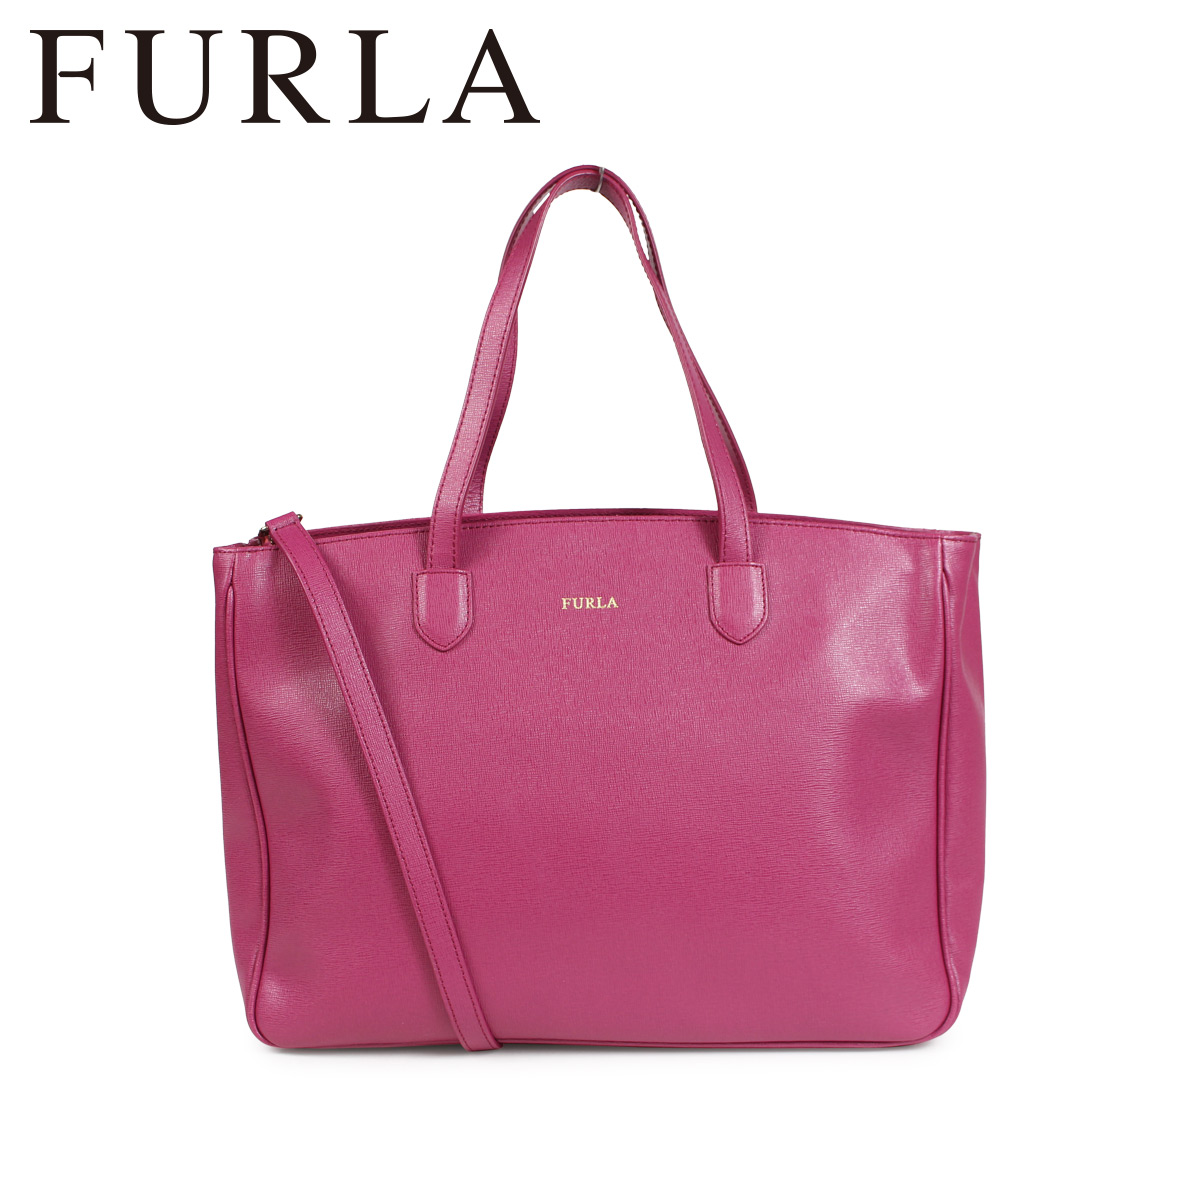 FURLA PAMELA LEATHER TOTE BAG フルラ バッグ トートバッグ レディース ピンク 920603